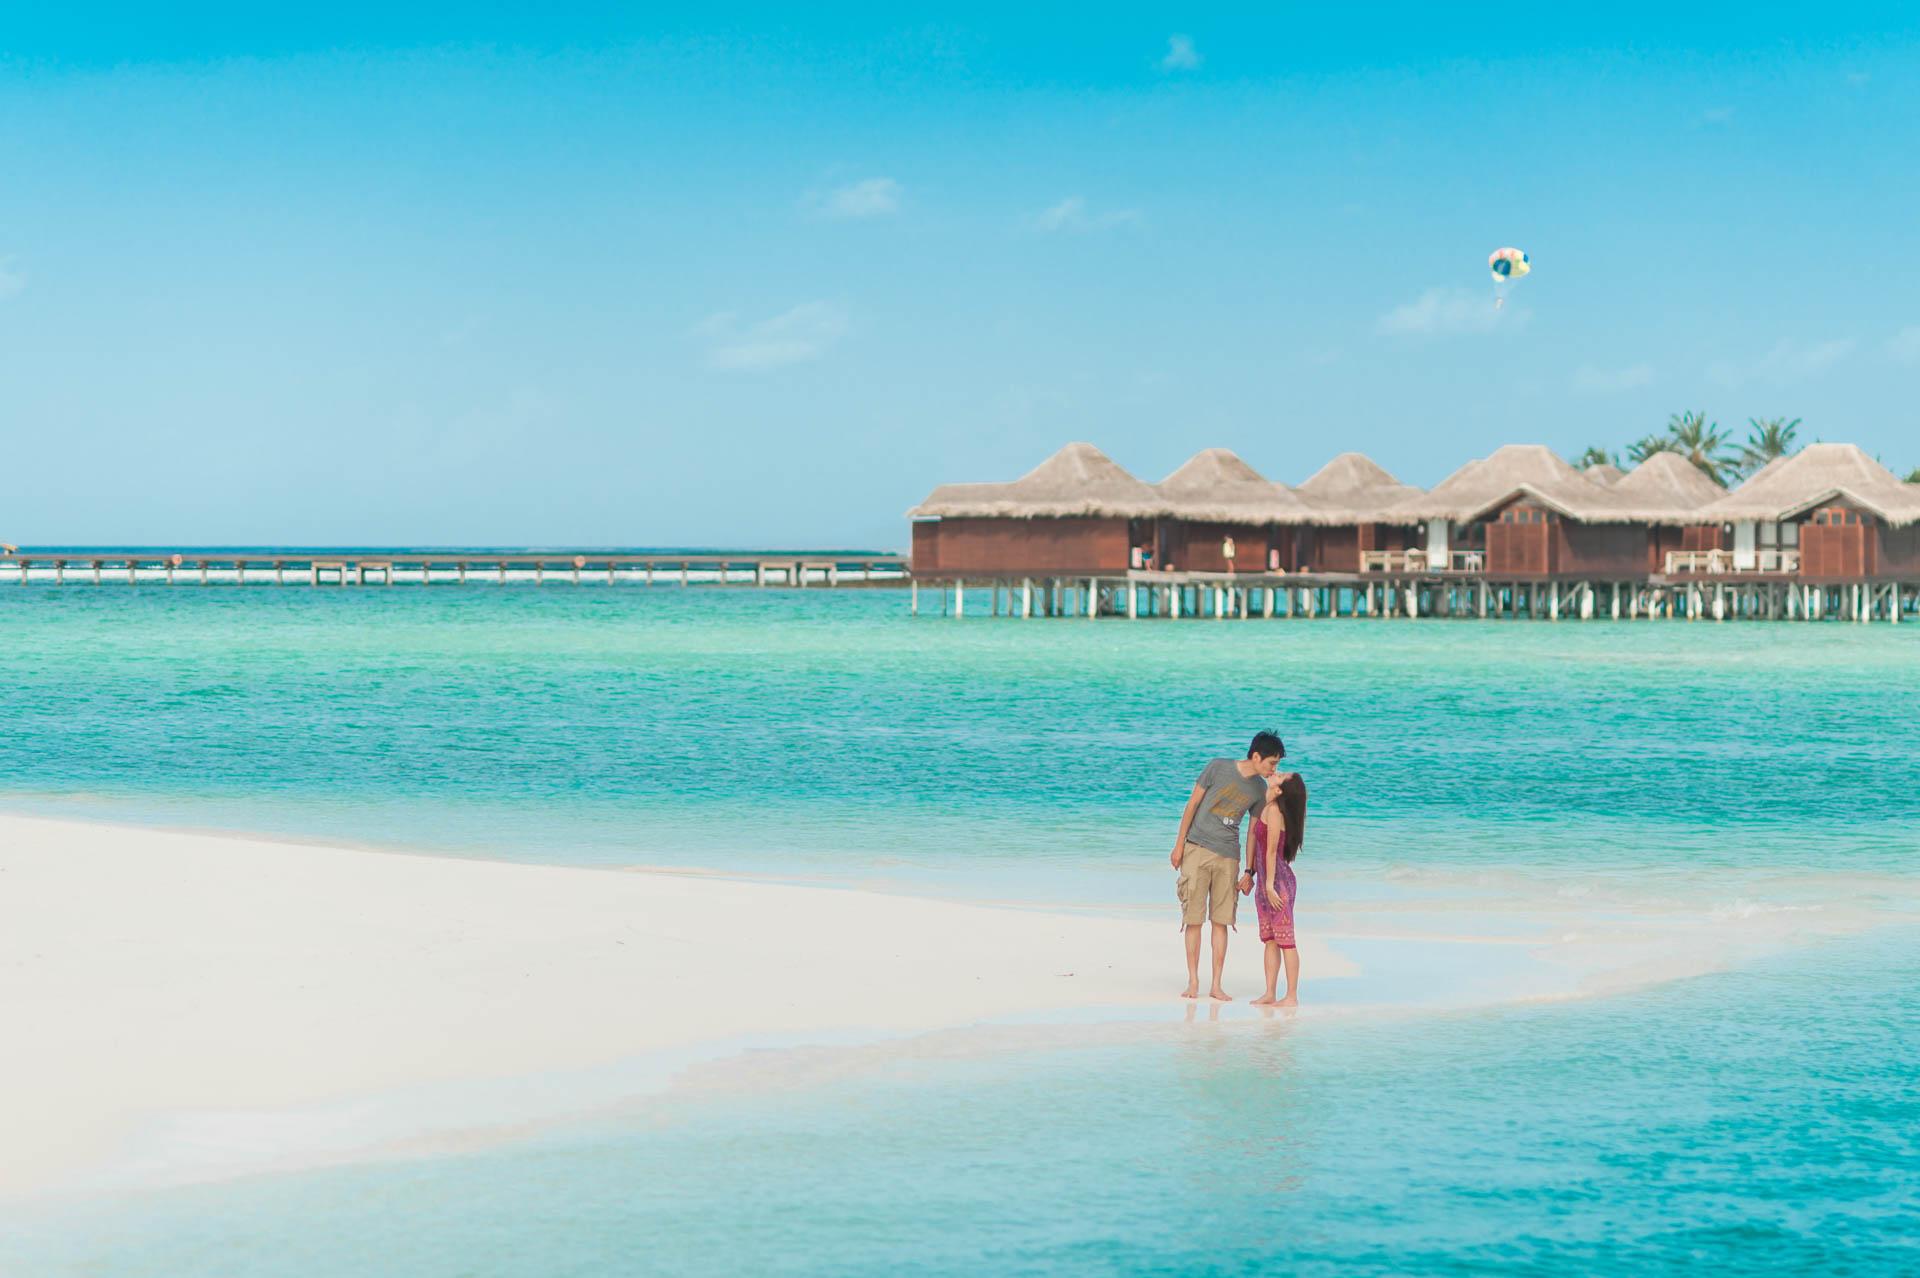 Charmy and Samson Honeymoon Photoshoot at Anantara Dhigu Veli and Naladhu Resort in Maldives by Asads Photography 16